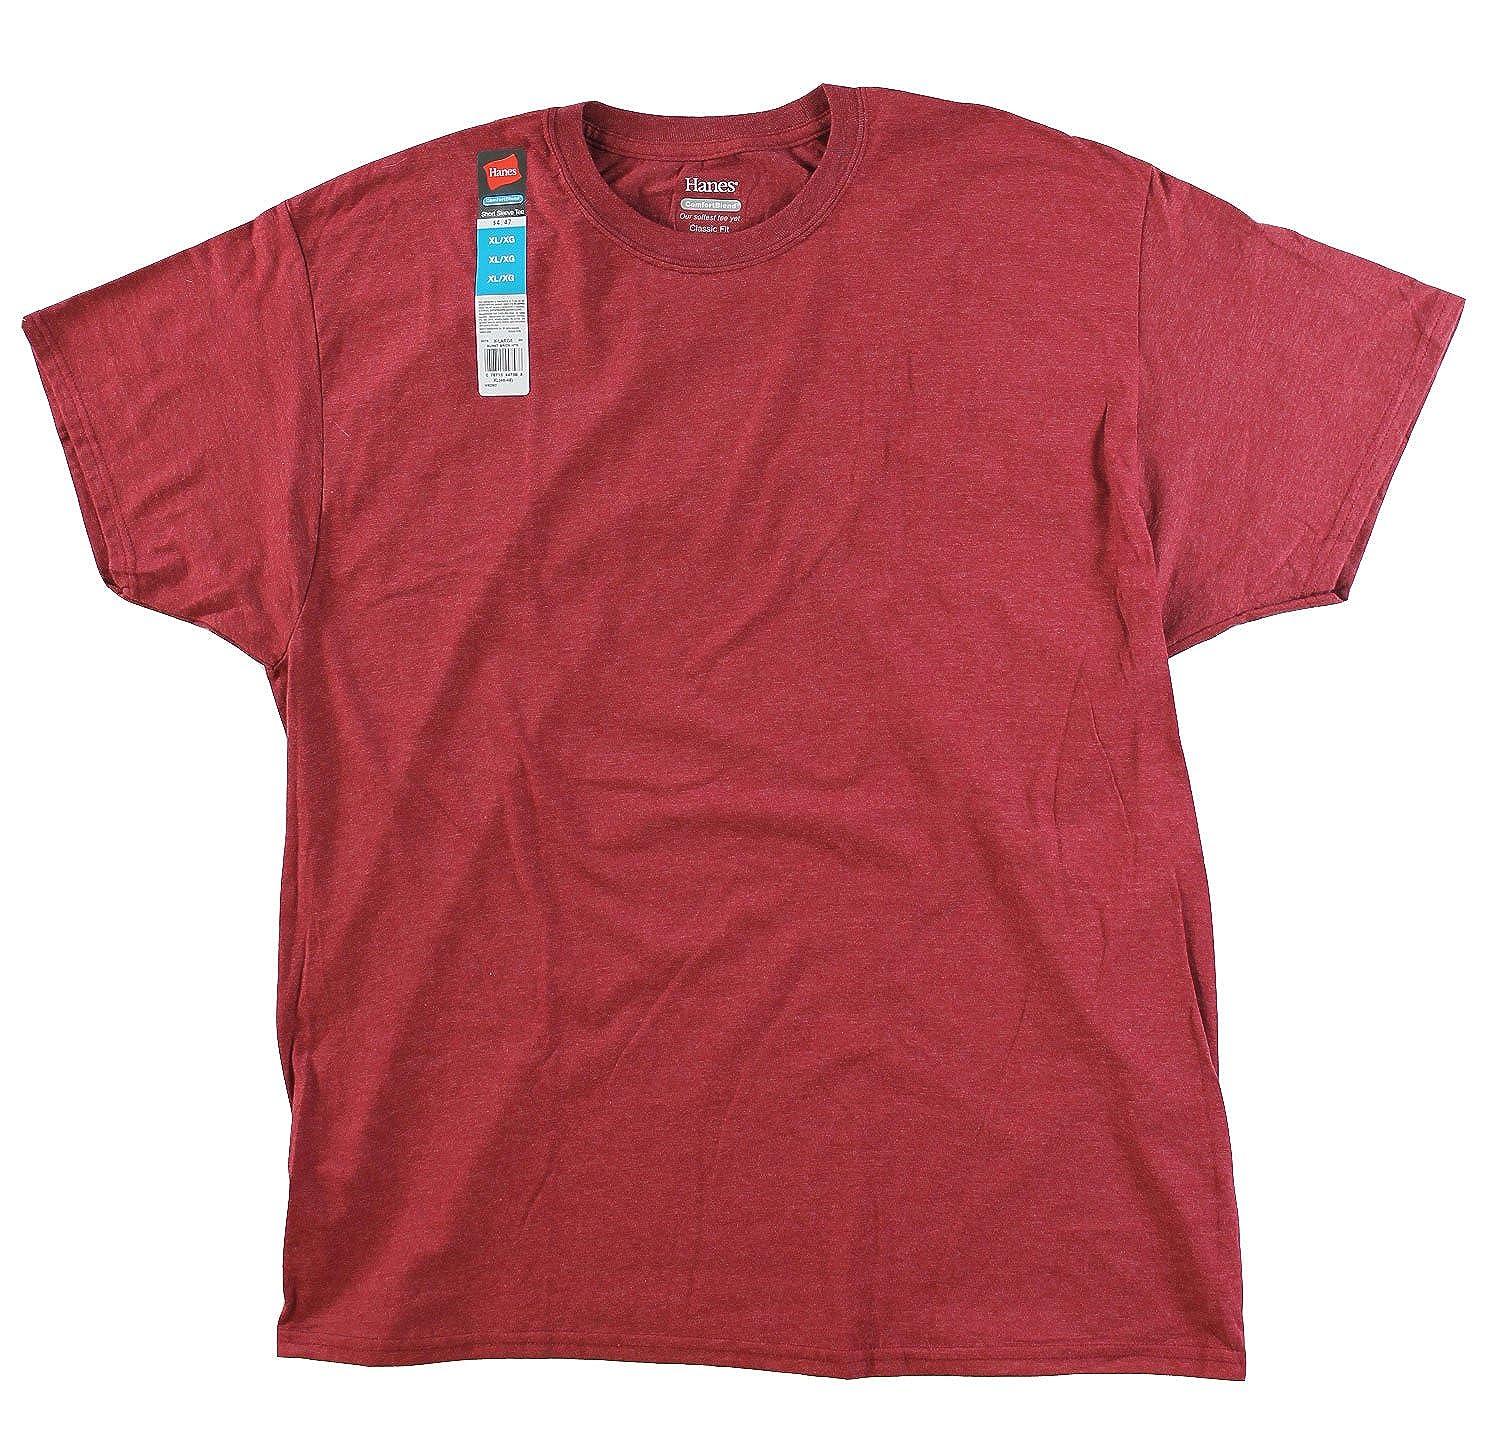 e7f87fd9b686 Hanes Men's ComfortSoft T-Shirt (Pack of 4) (Large, Burgandy) at Amazon  Men's Clothing store: